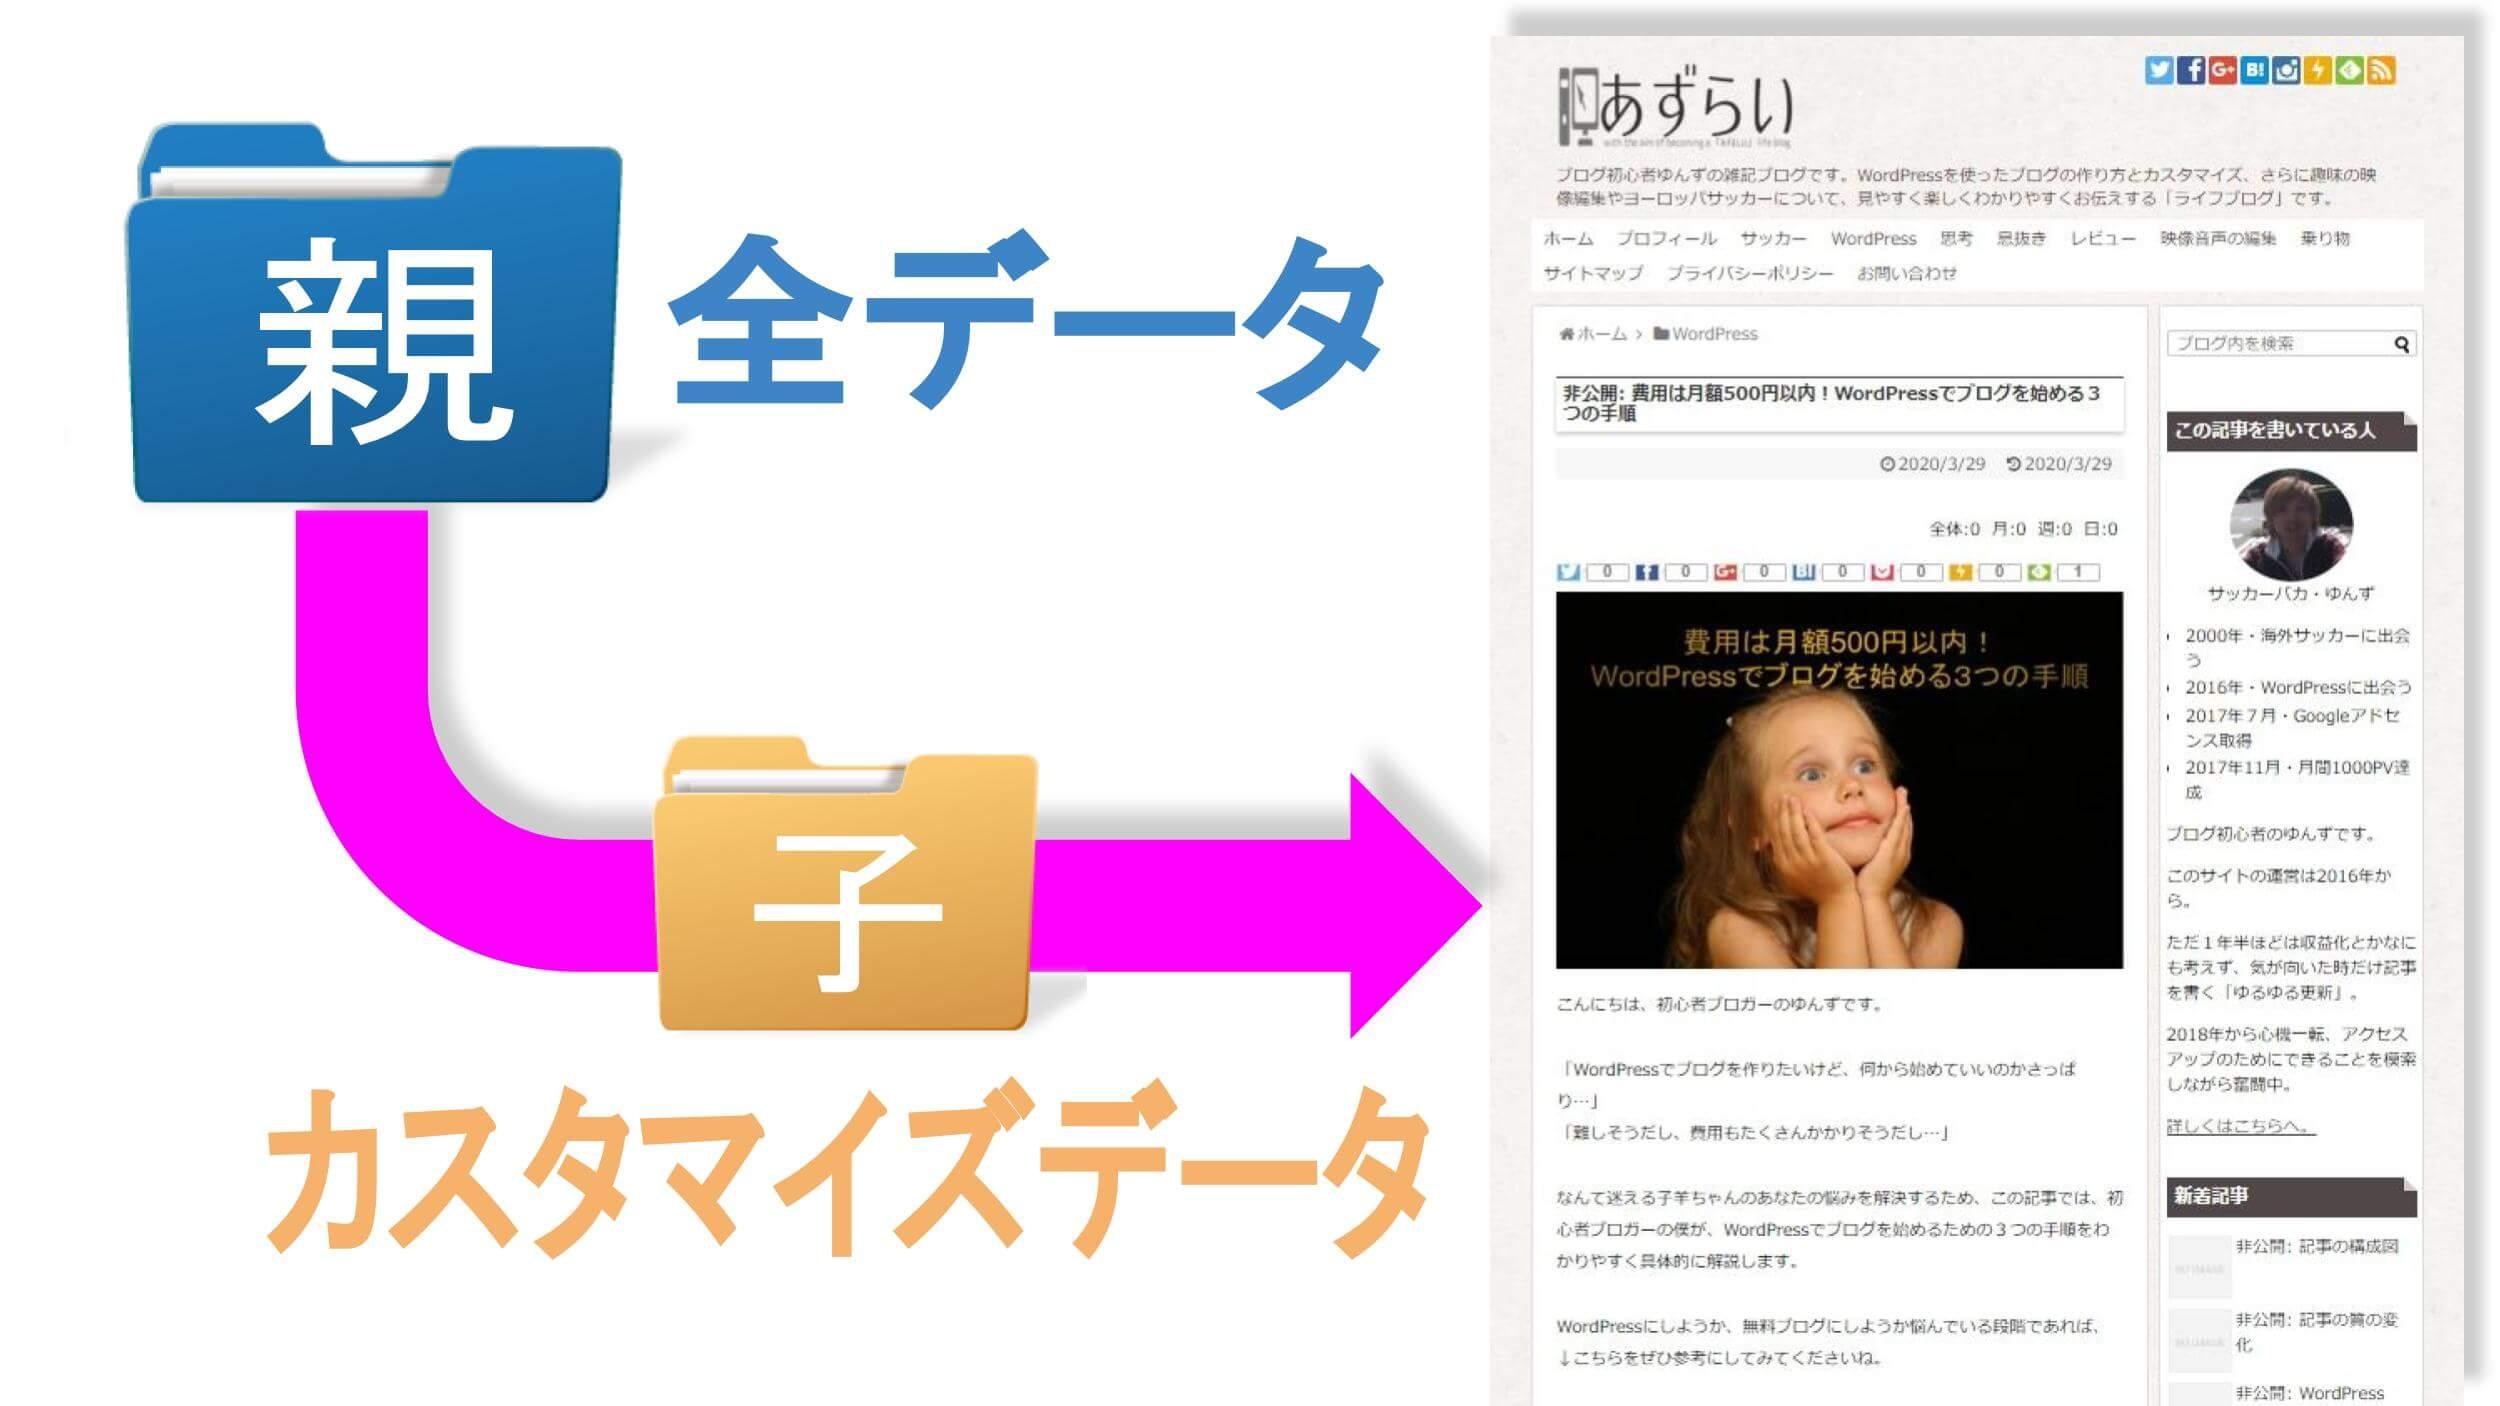 Webサイト表示時の親テーマと子テーマの関係性